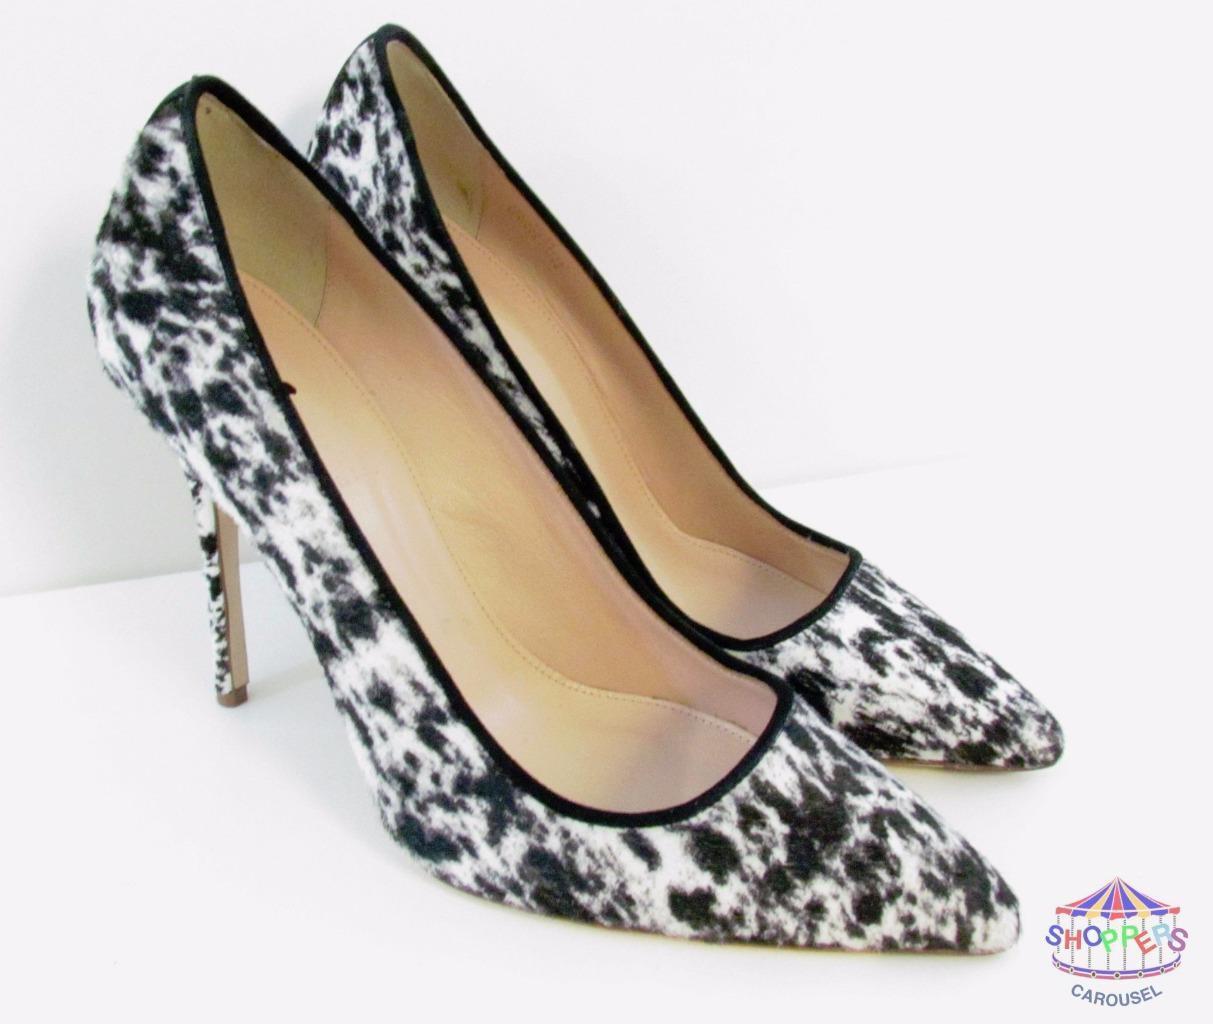 J Crew Collection Roxie Negro Pantorrilla Cabello Bombas Tacones Zapatos Negro Roxie blancoo  378 estilo b1004 c2b54c